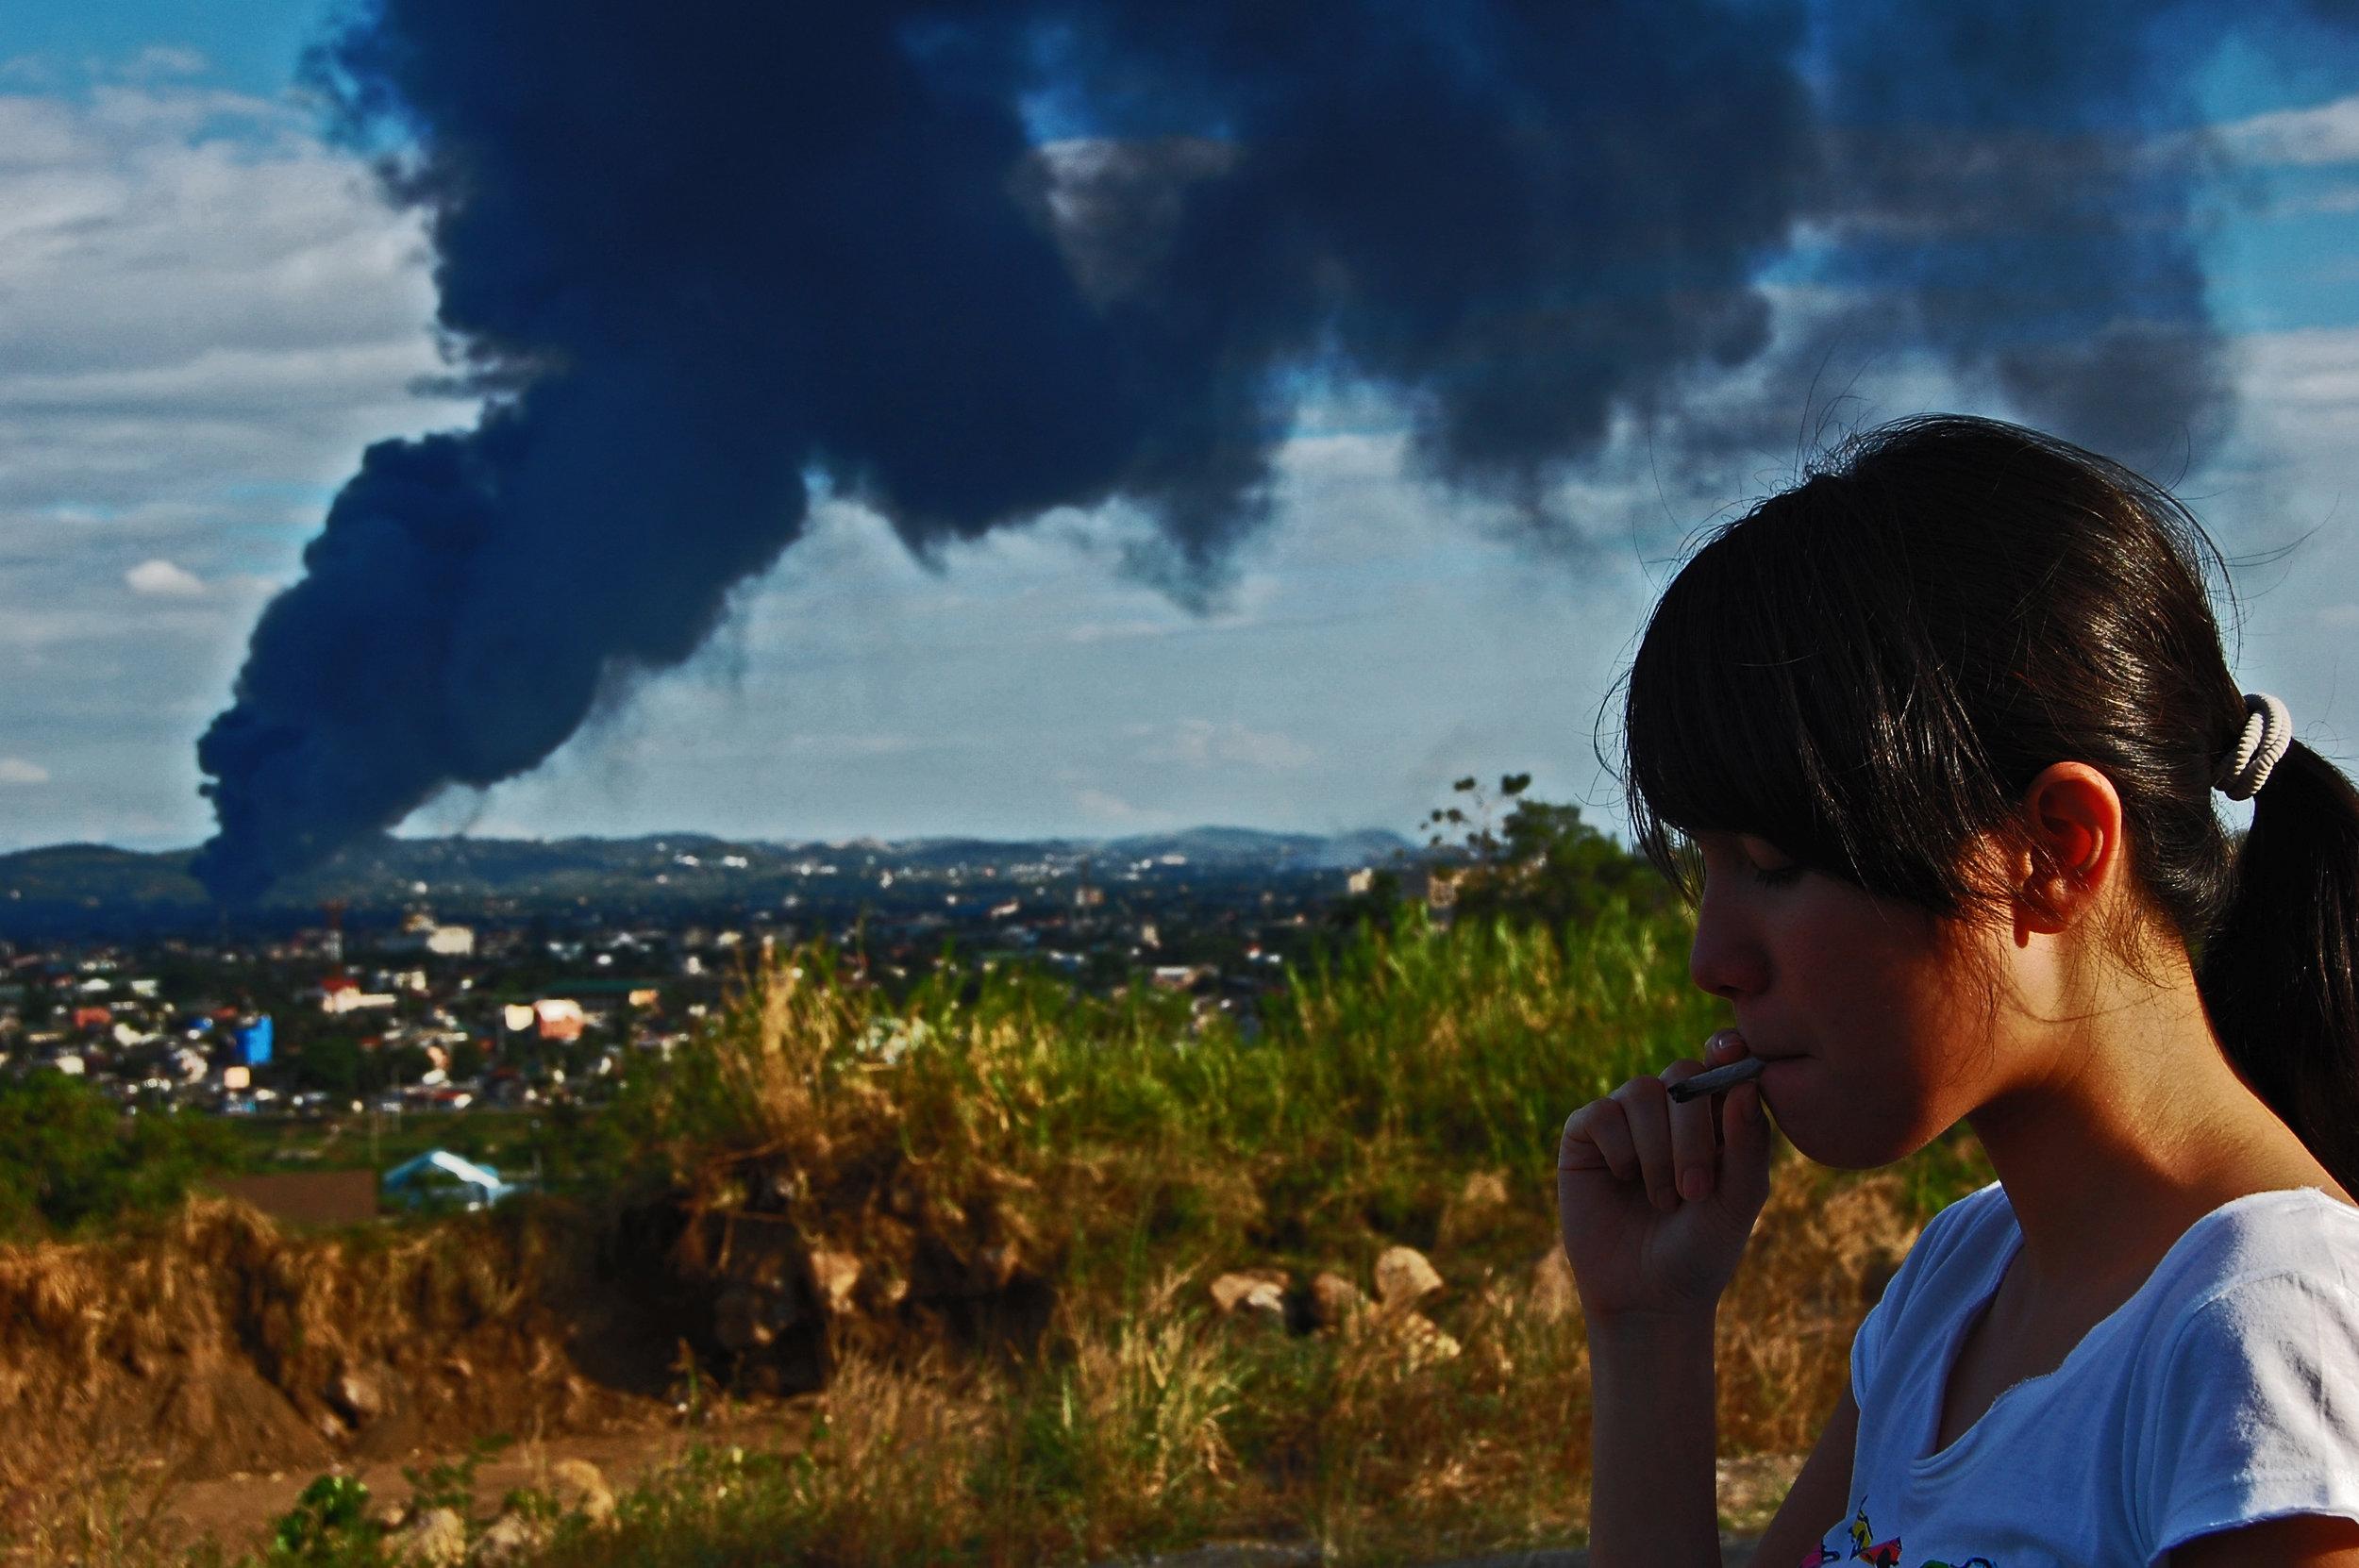 Marijuana use by teens gateway drug